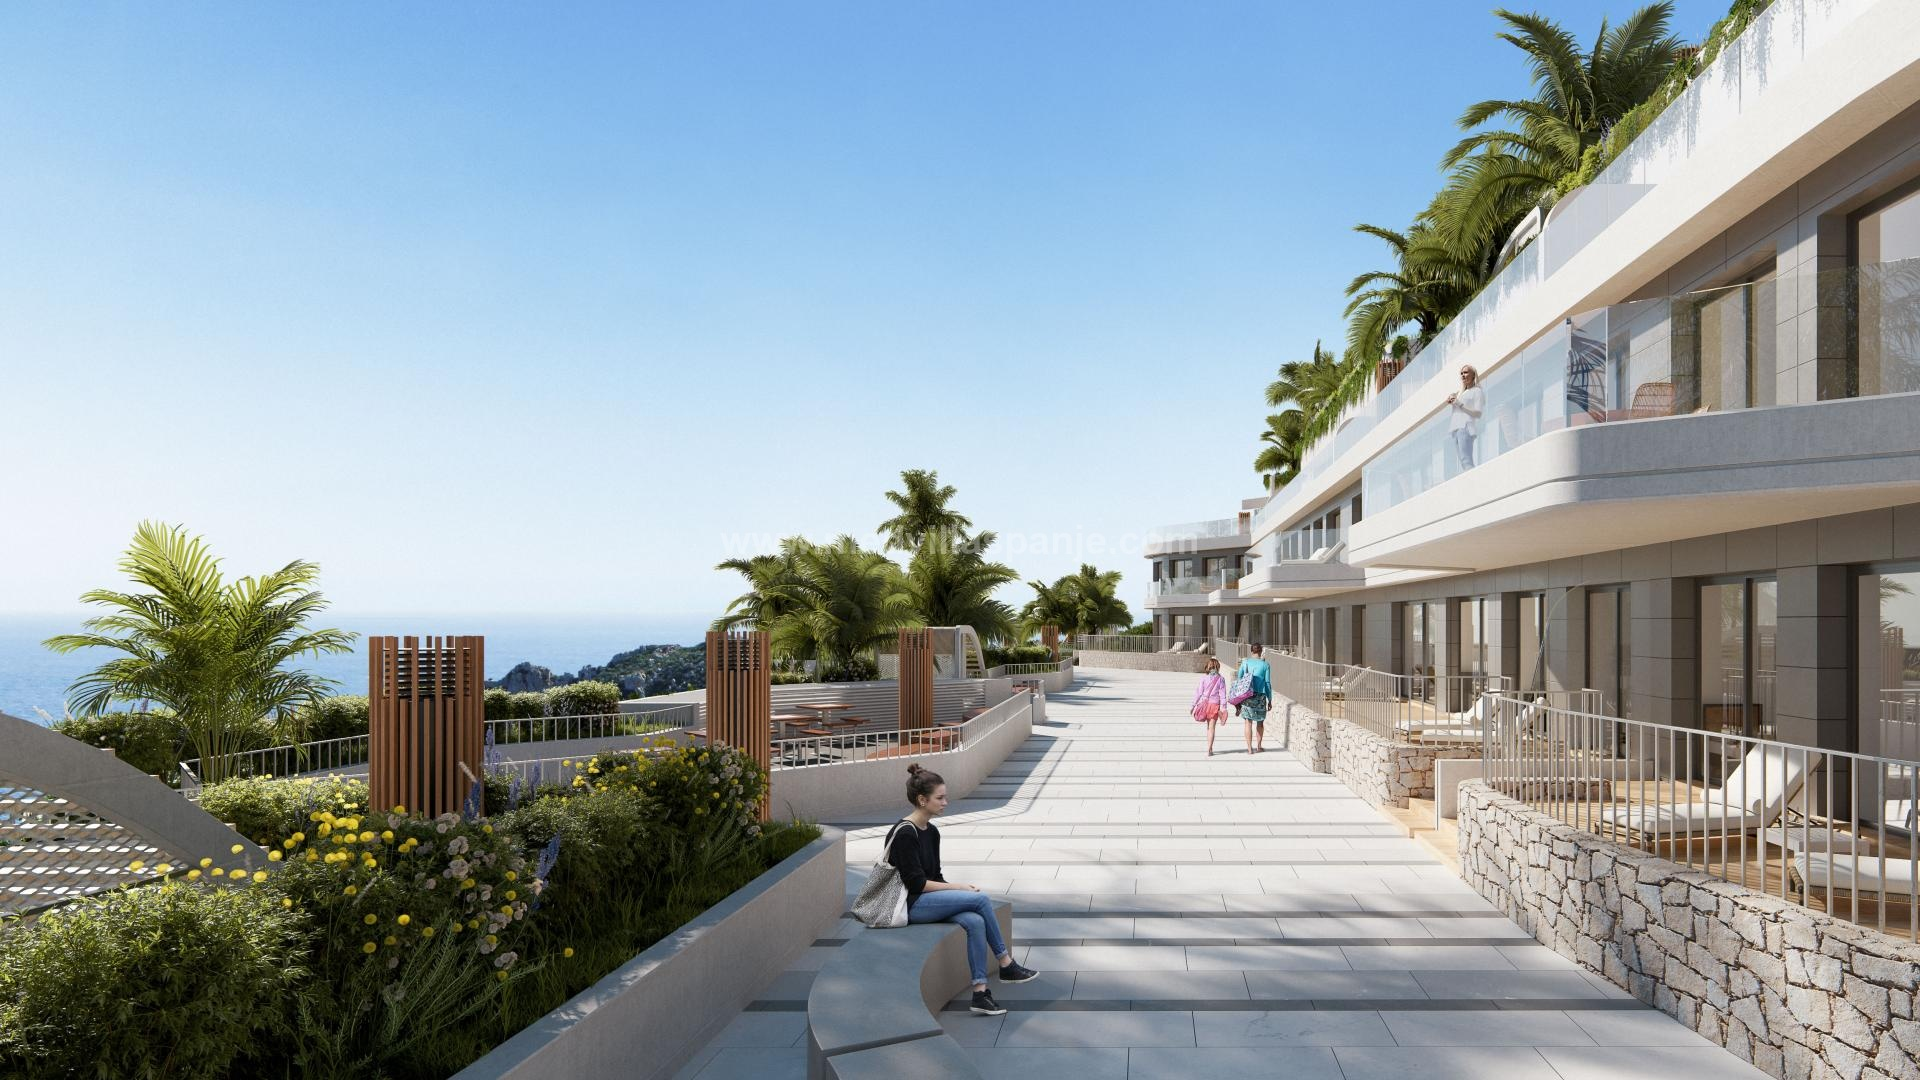 Appartement de 3 chambres à coucher à Aguilas, Costa Cálida in Medvilla Spanje